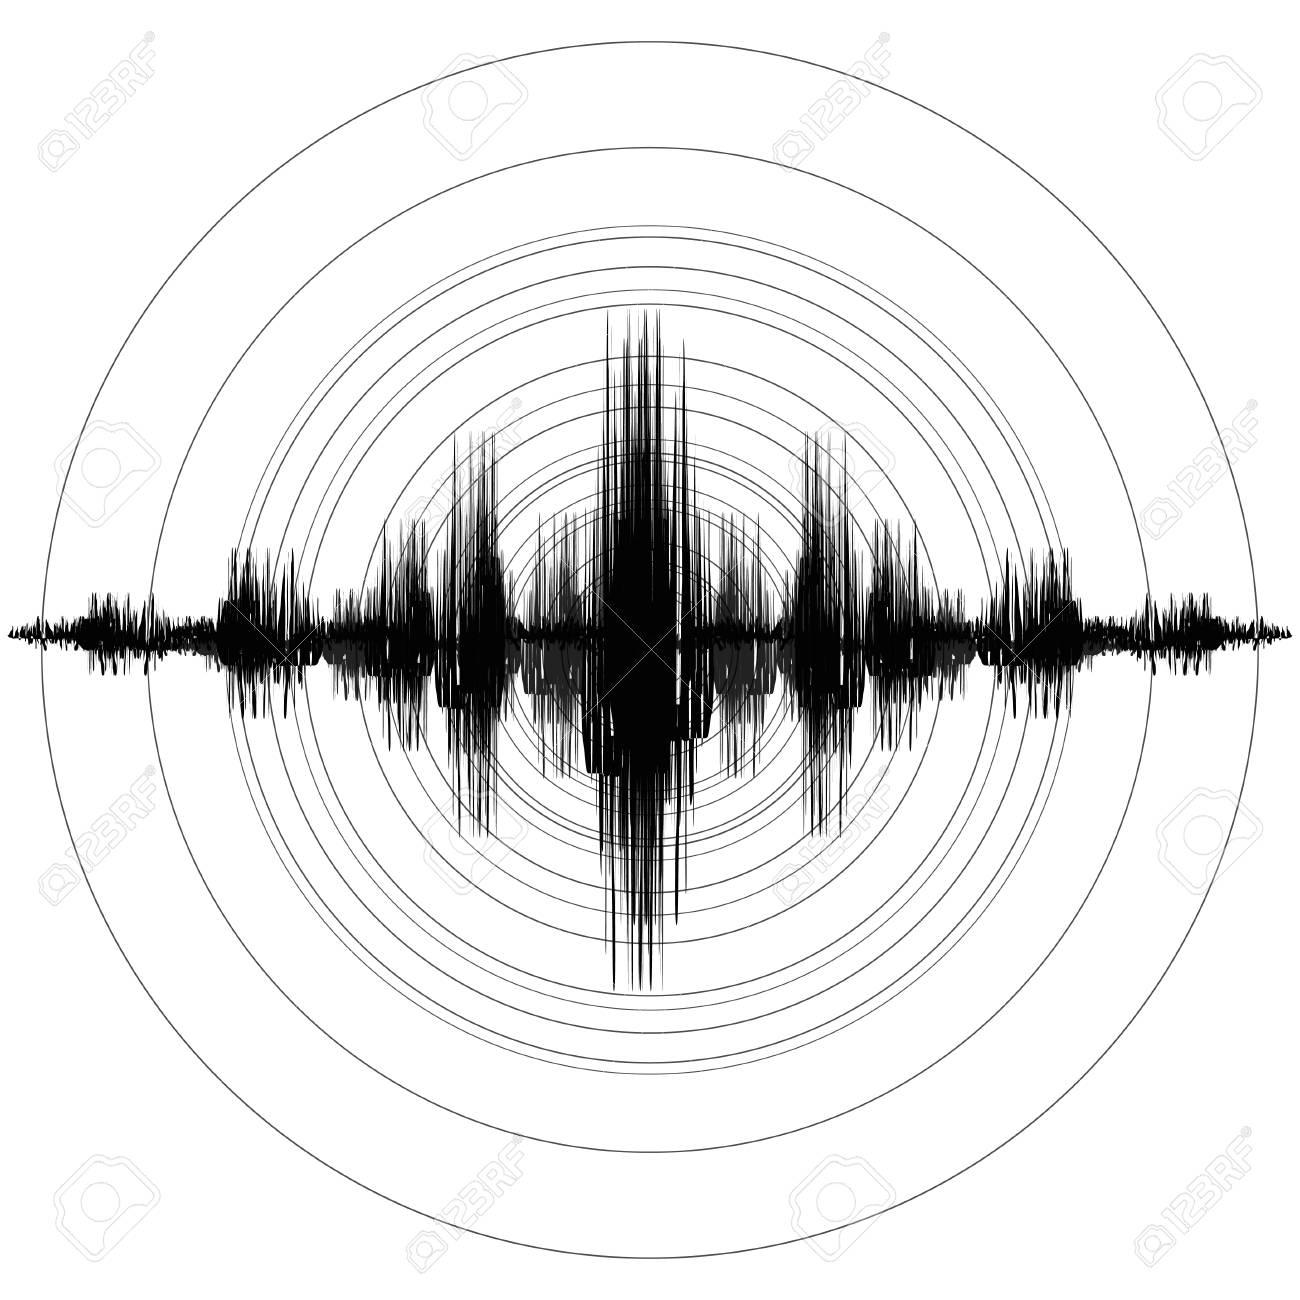 Earthquake. Richter Earthquake Magnitude Scale. Vector illustration - 112219295